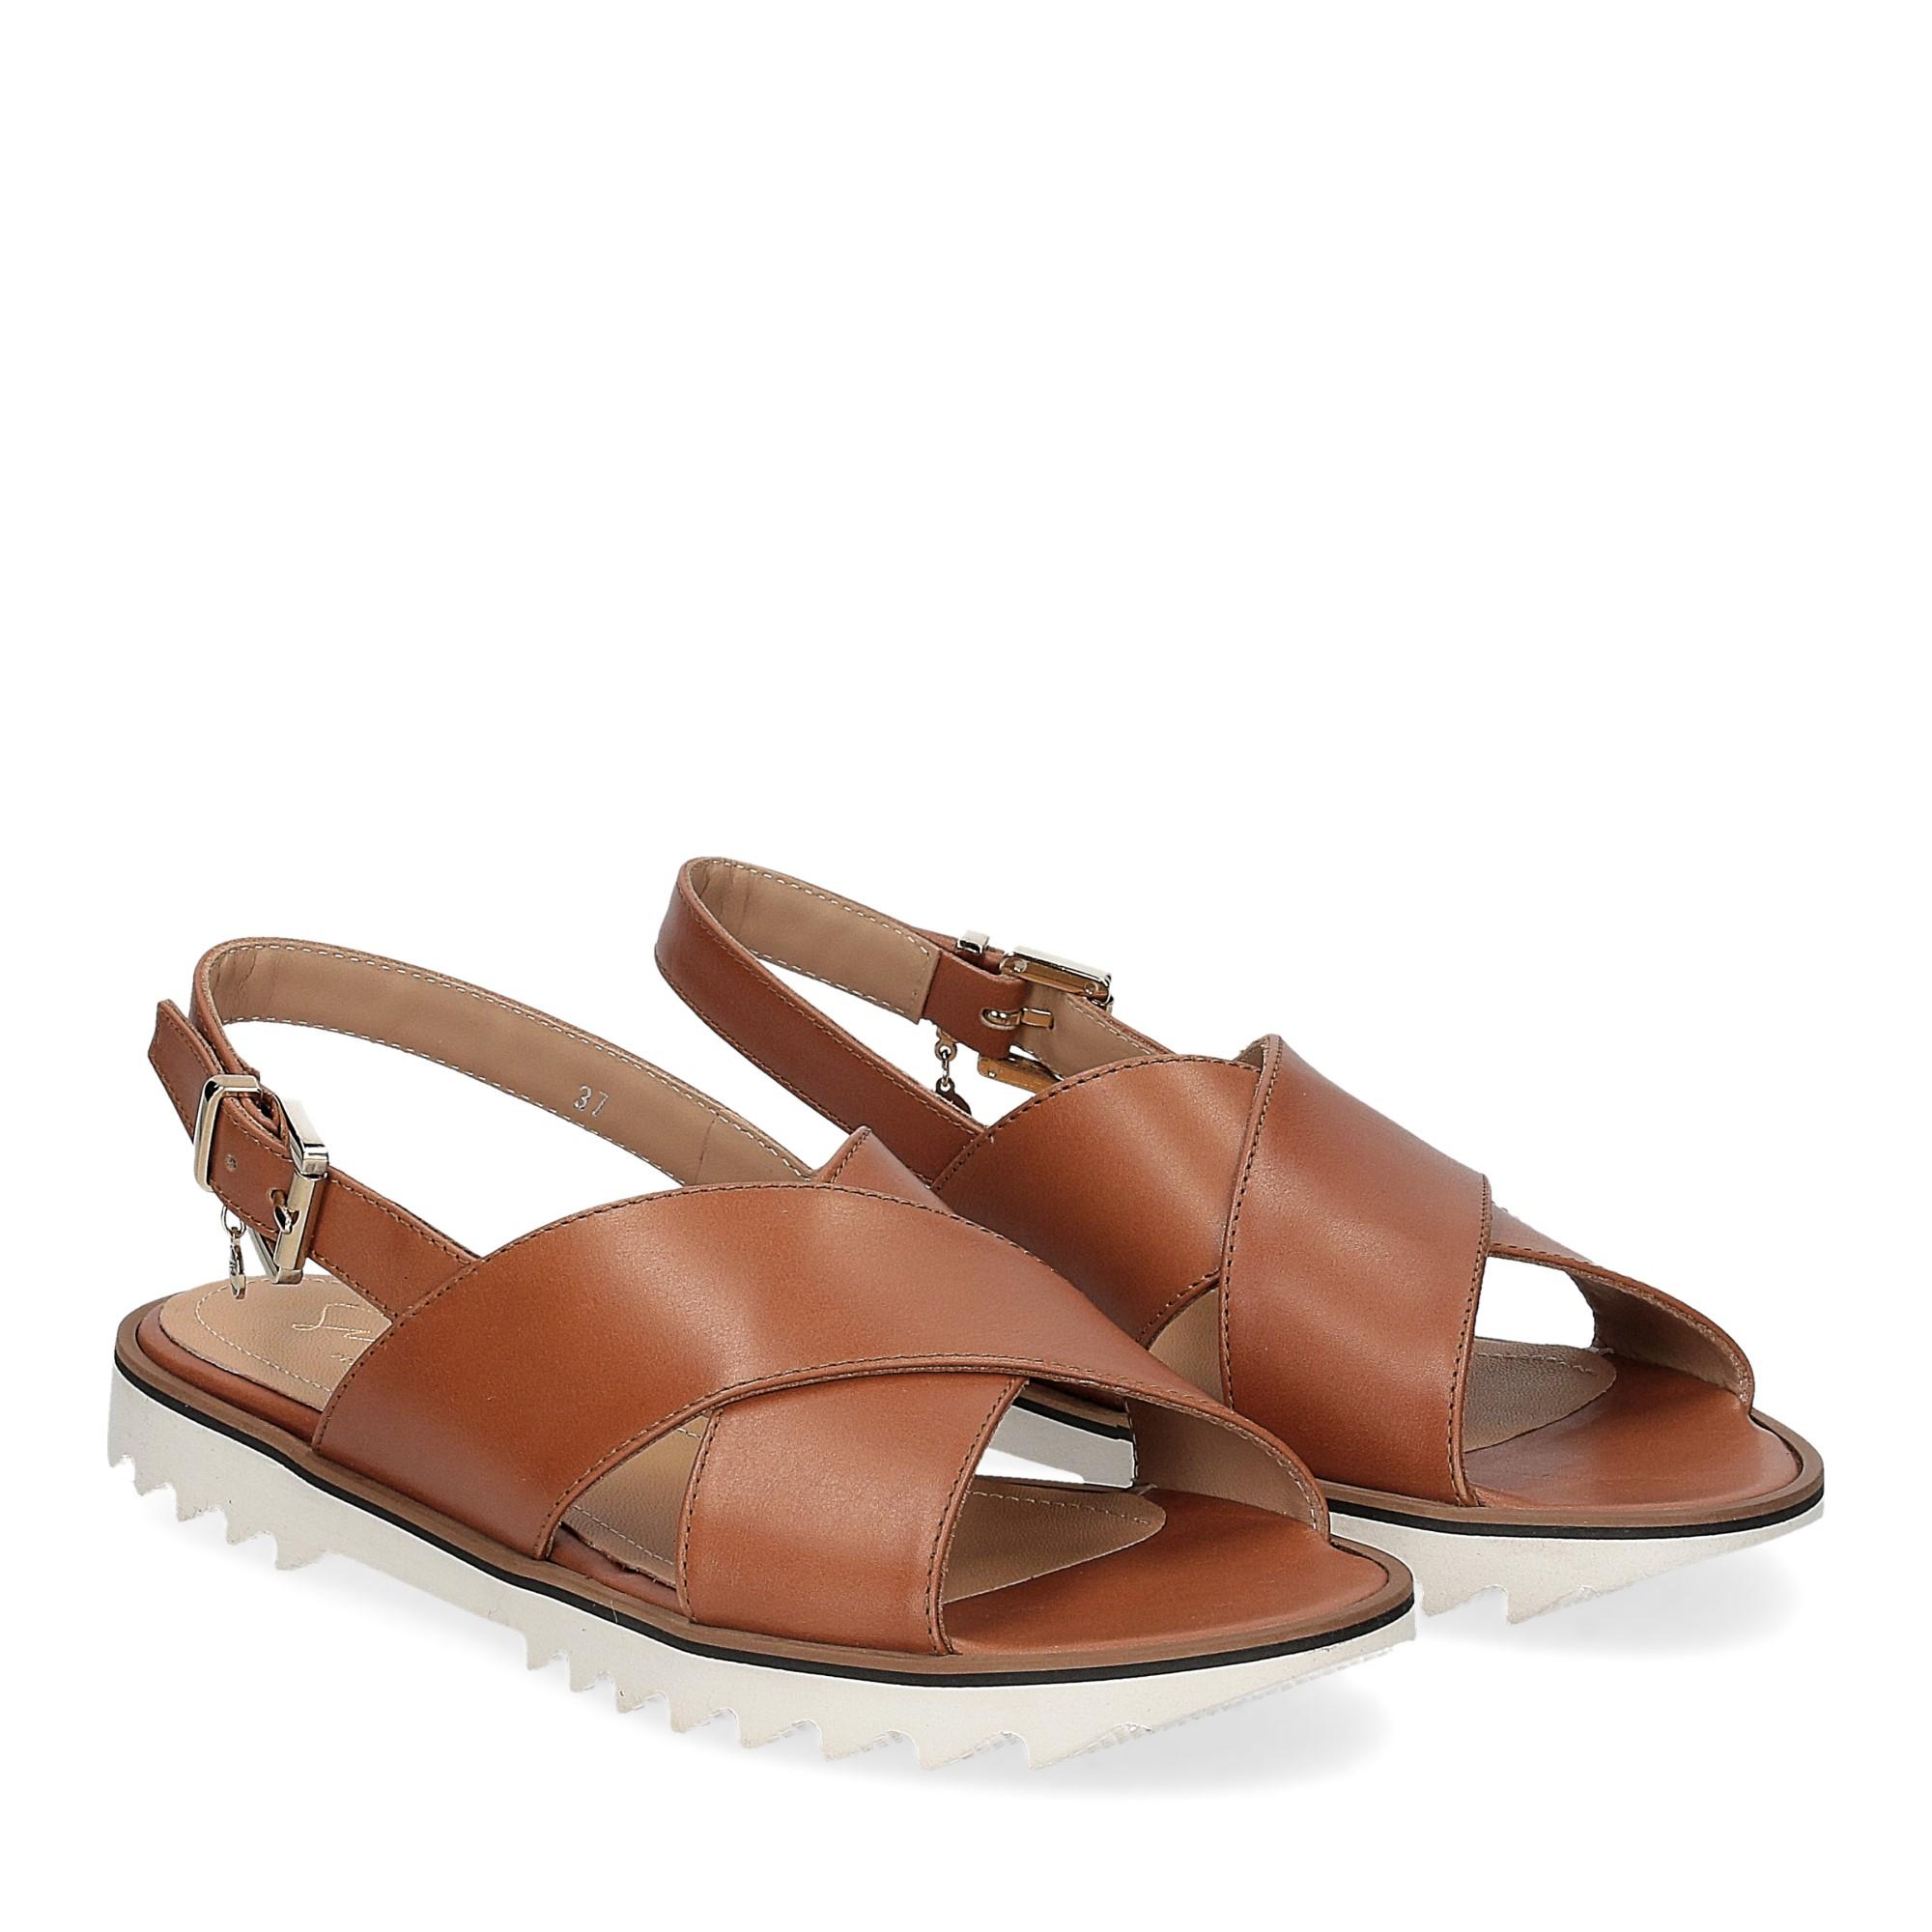 Siton sandalo pelle cuoio